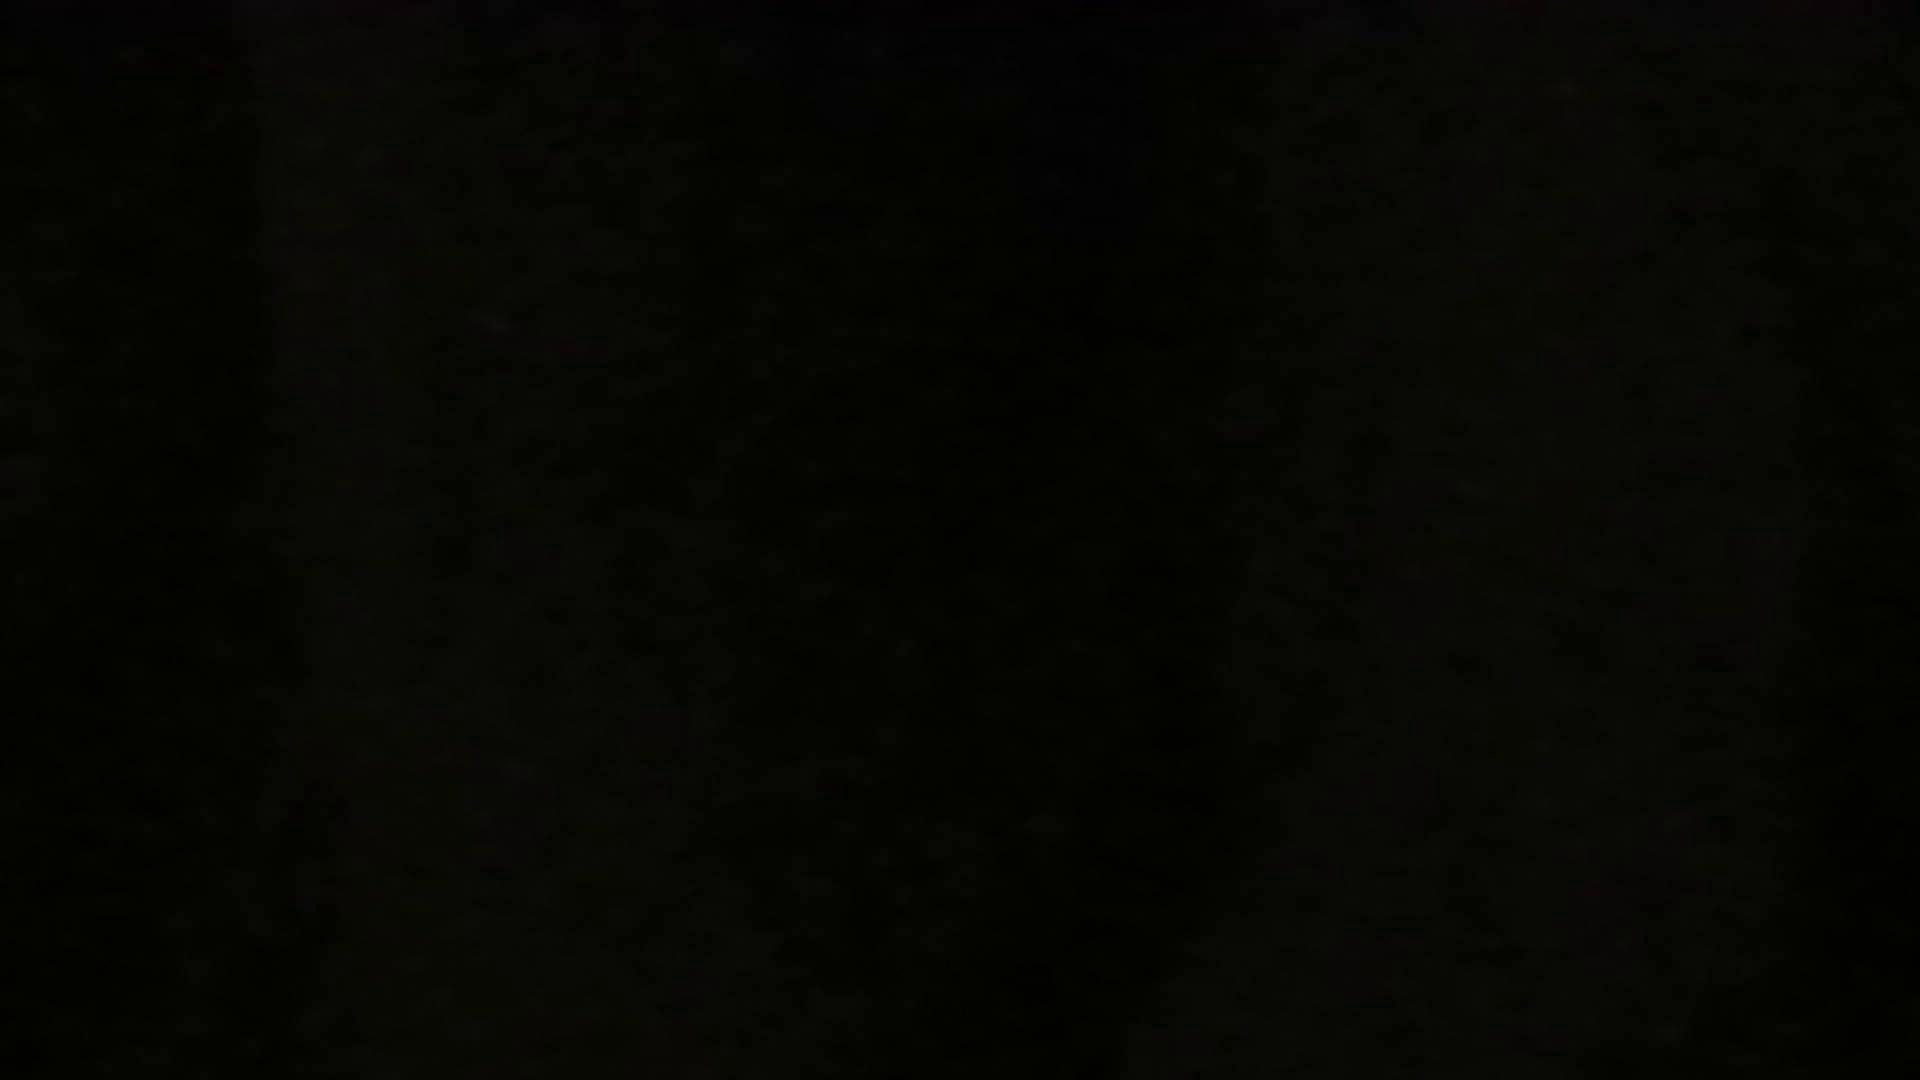 SPYさん初投稿!マンション覗き!5000K!ハイビジョン撮影VOL.05(元サッカー部員社会人) スポーツマン  38pic 32